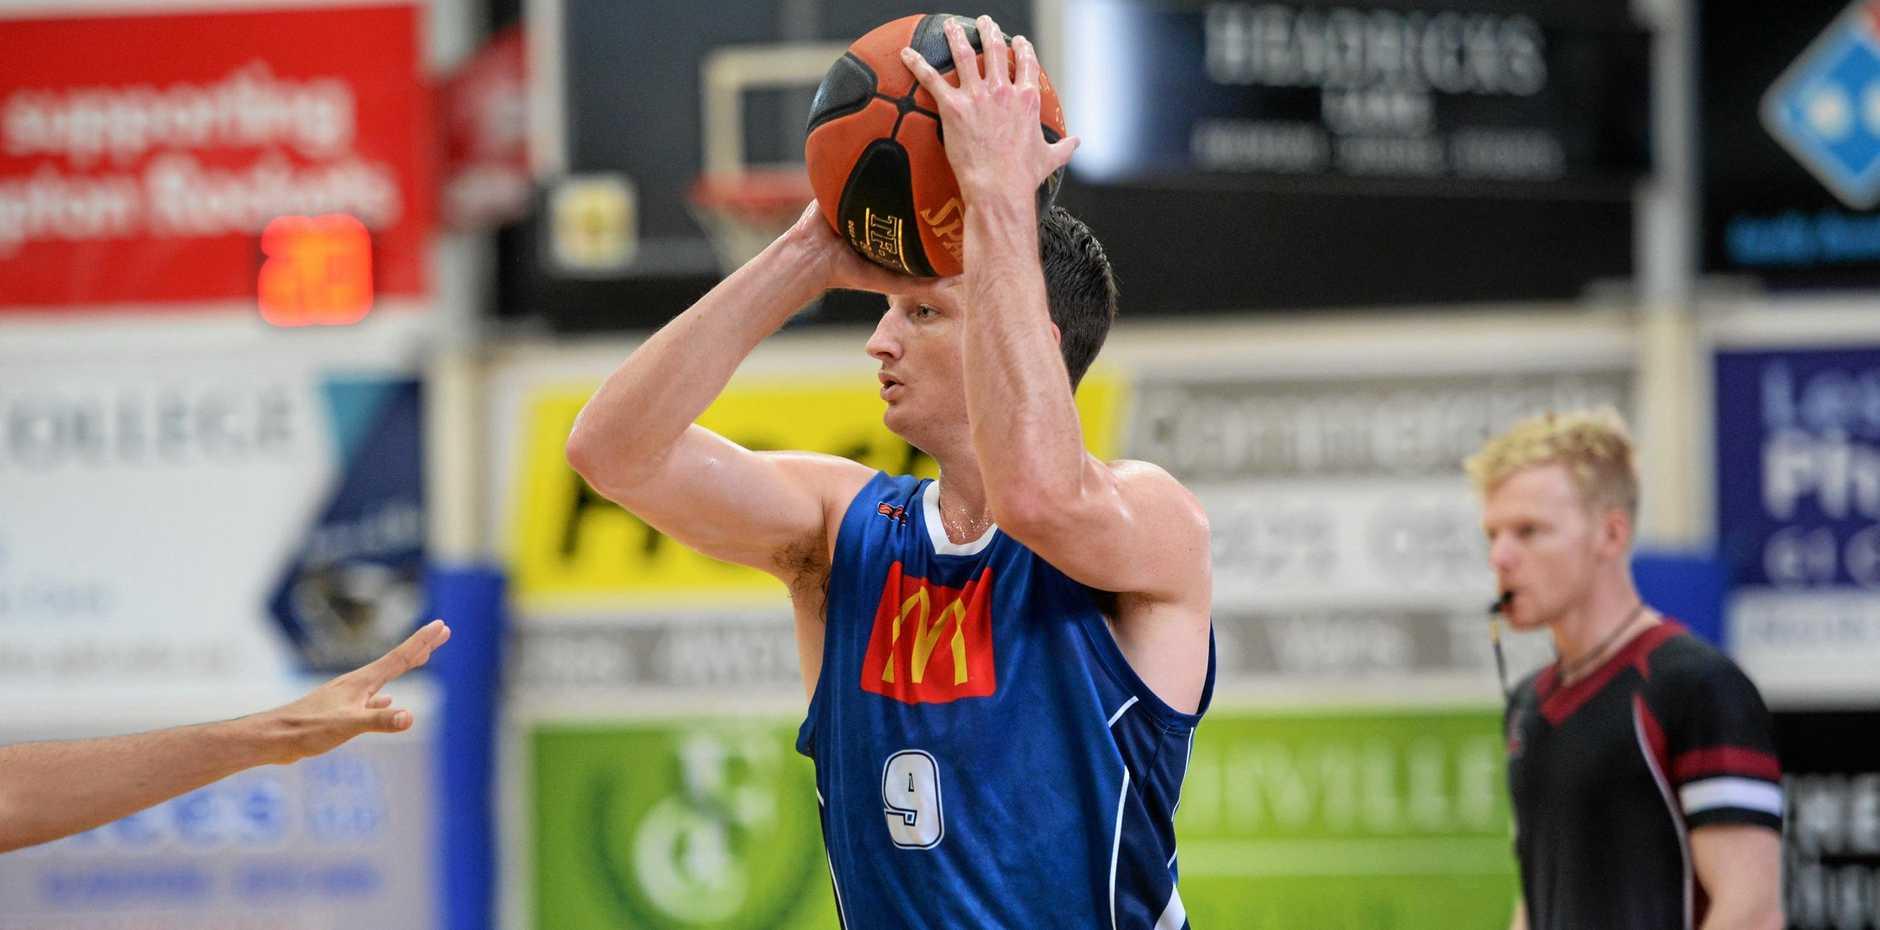 Rockets' Sean O'Mara. Rockets will head away for a triple header, beginning in Cairns tonight.